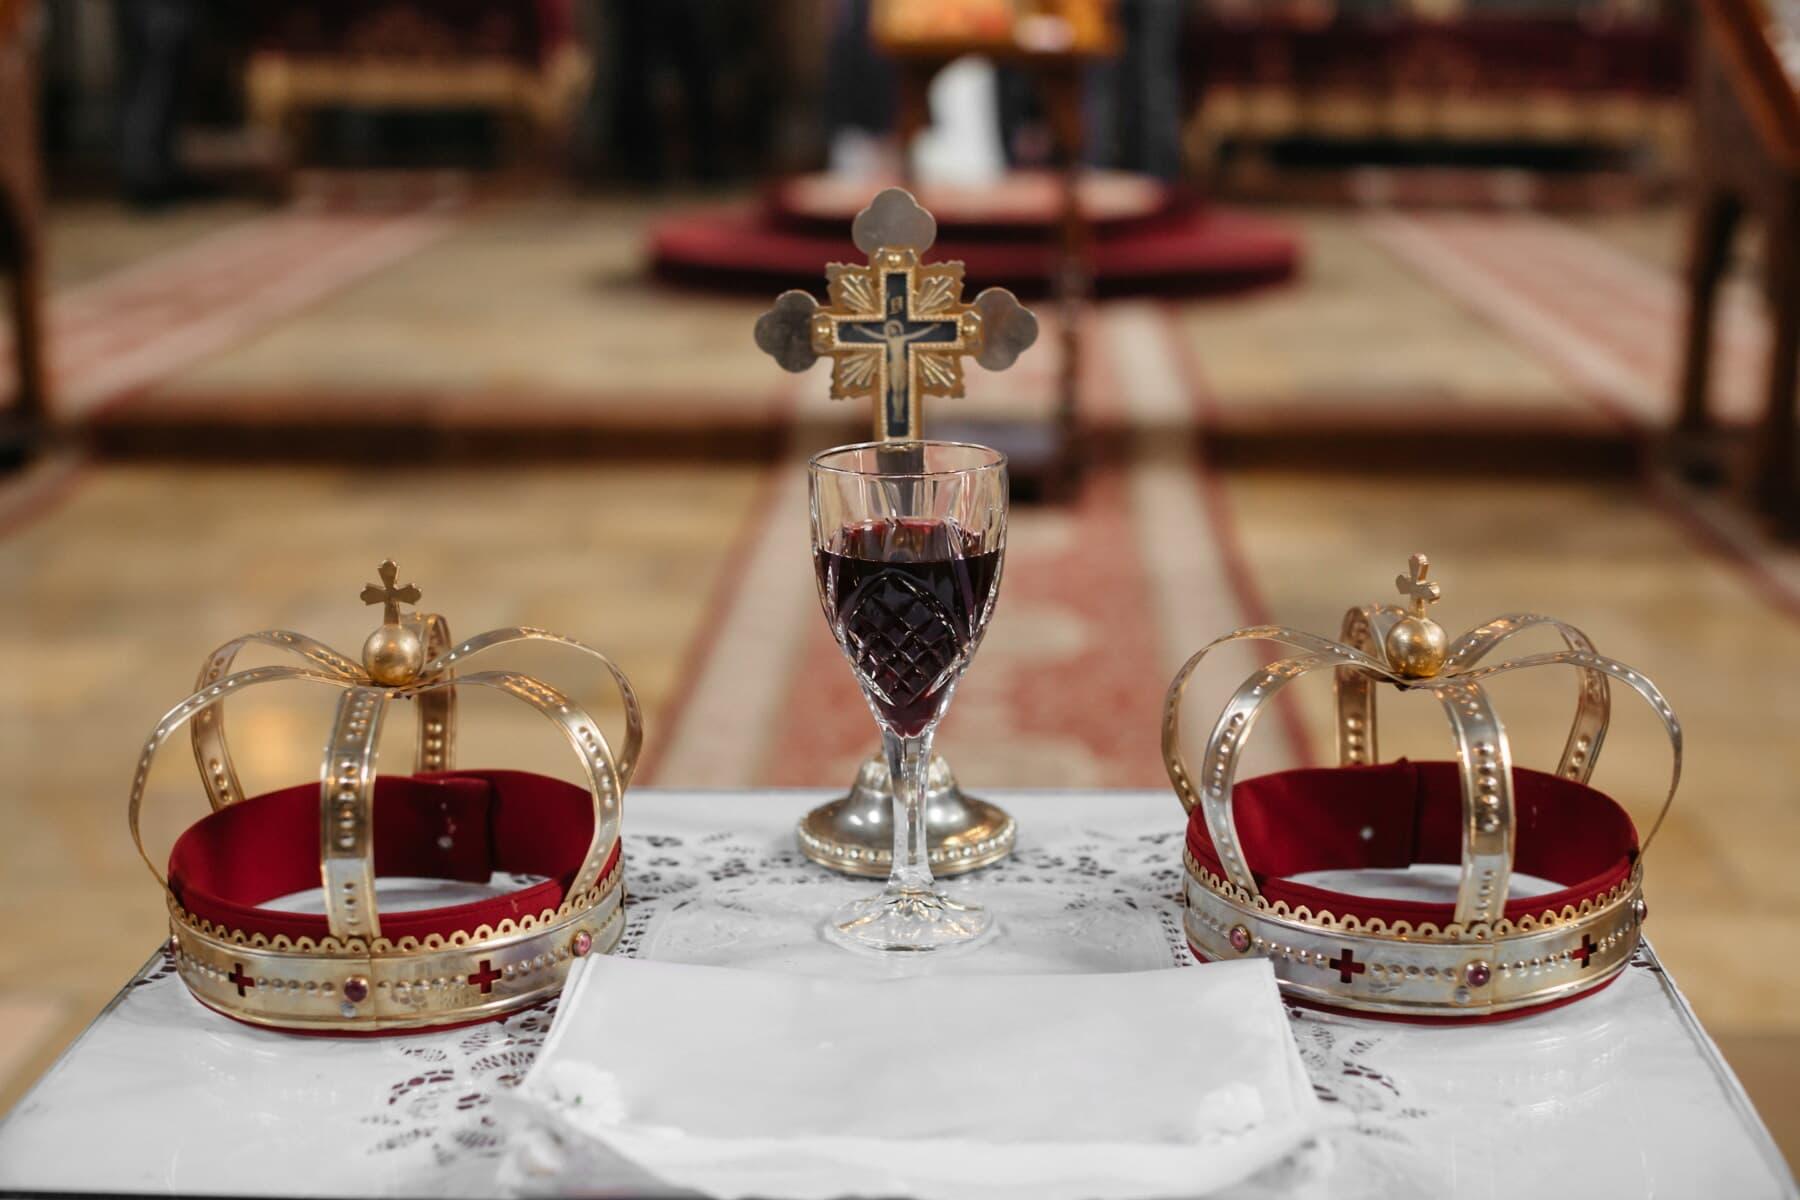 glass, crystal, red wine, gold, coronation, baptism, wedding, cross, crown, christianity